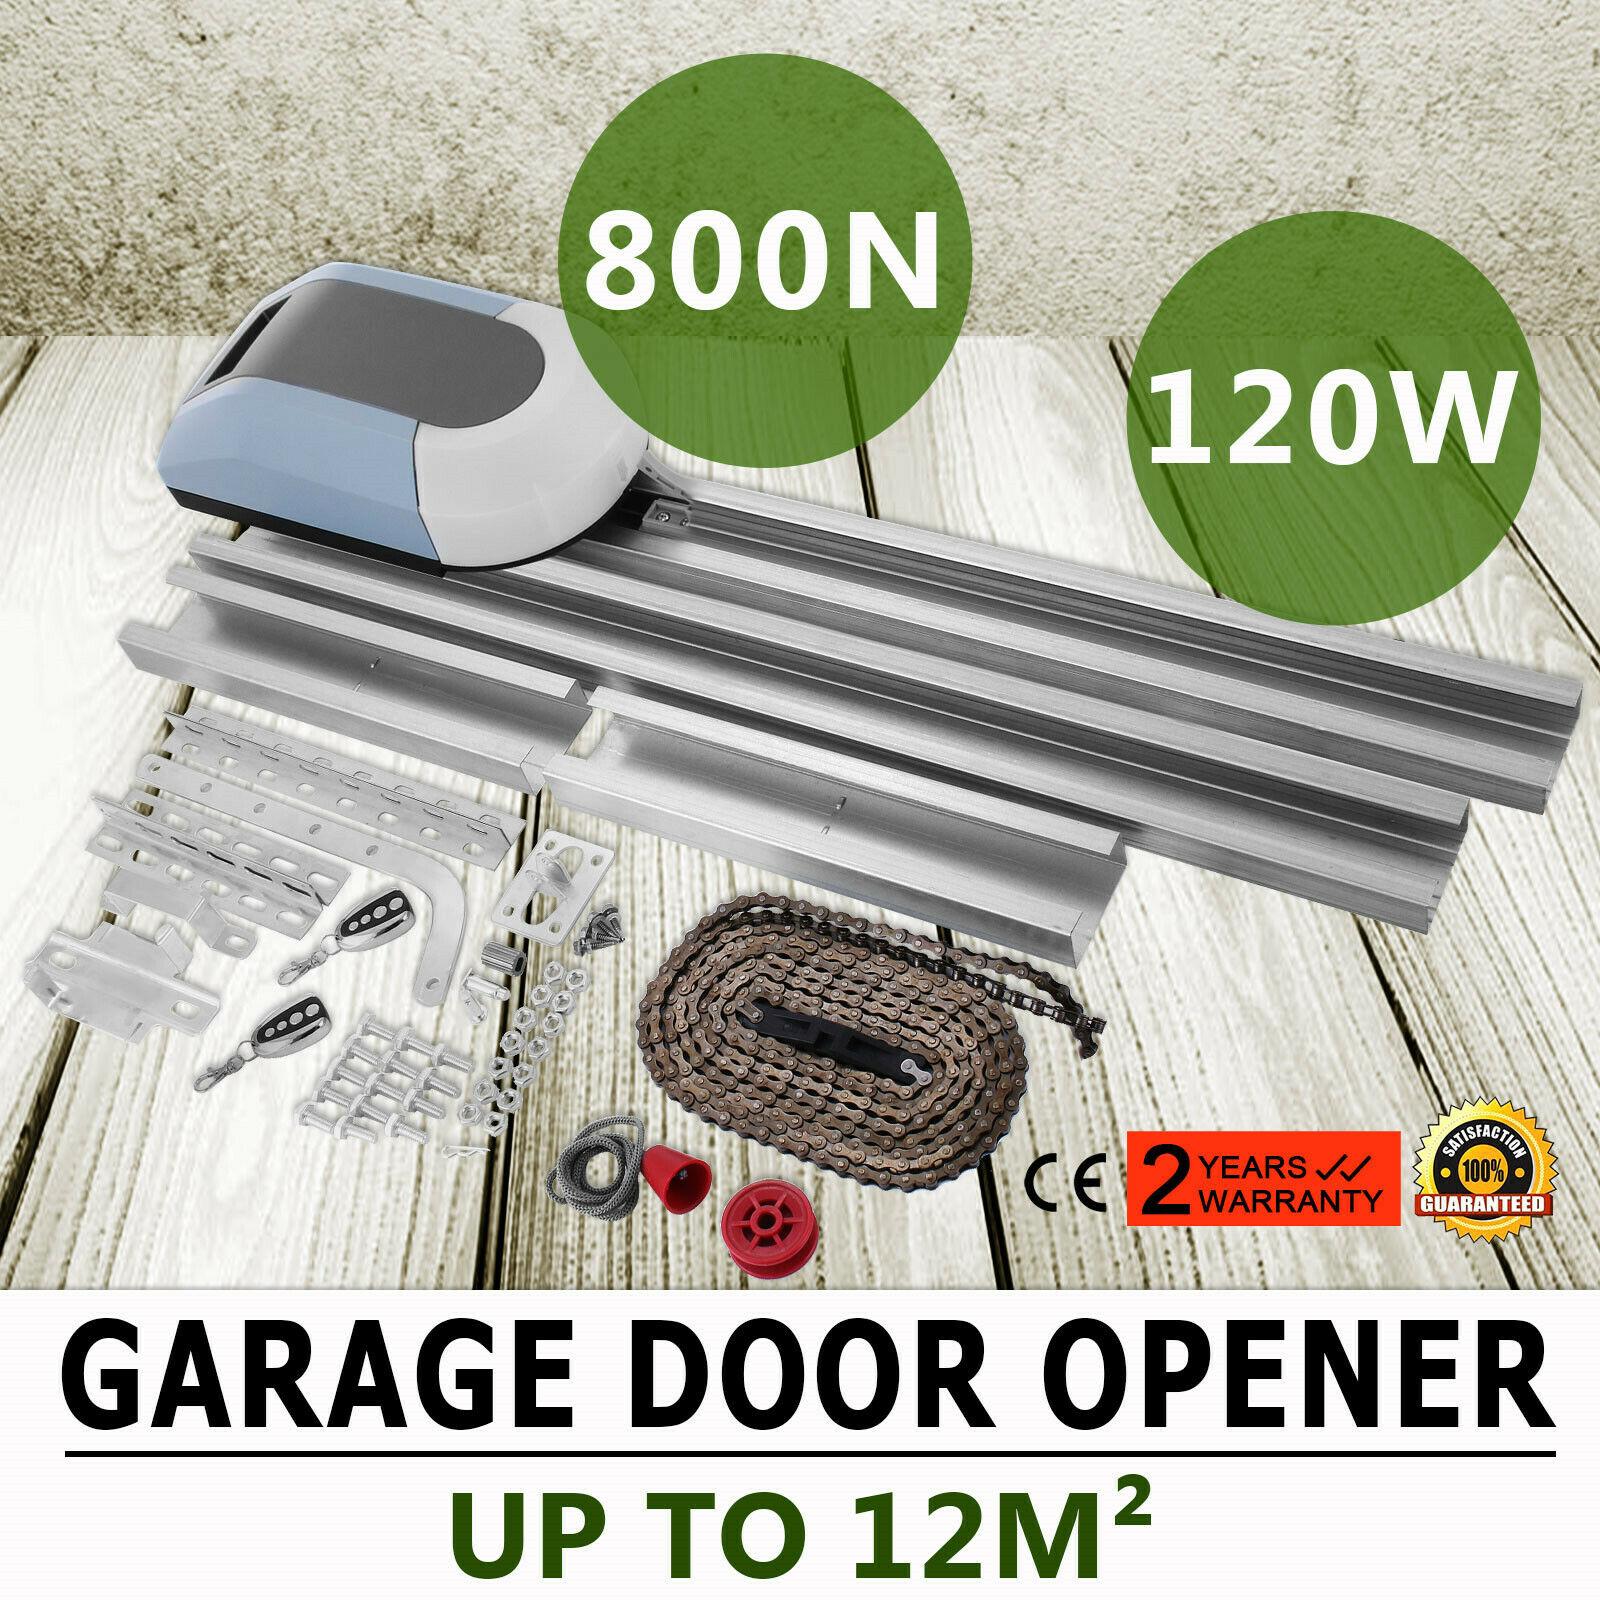 Garage Door Opener Garage Engine Automatic Operator Force 800N Advanced Technology 2 Remote Control